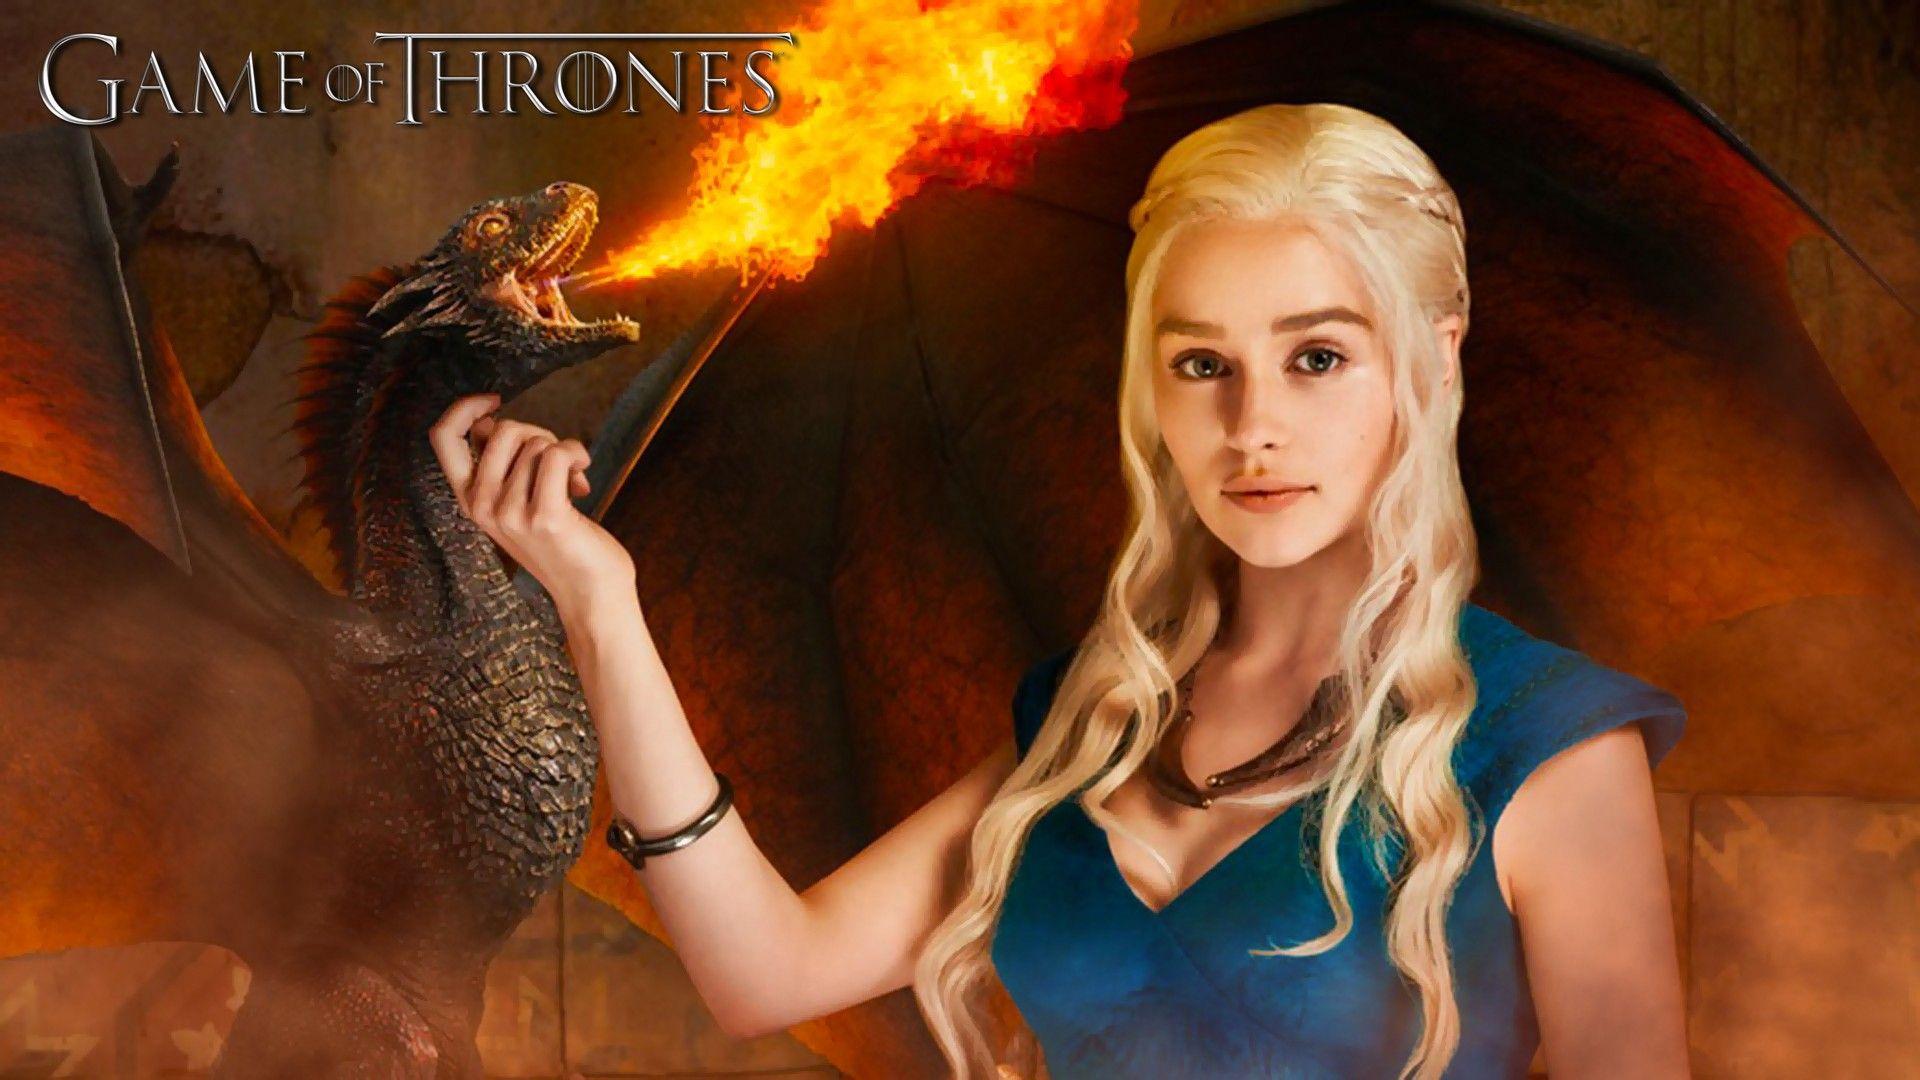 Emilia Clarke Beautiful Hd Wallpaper For Desktop Game Of Throne